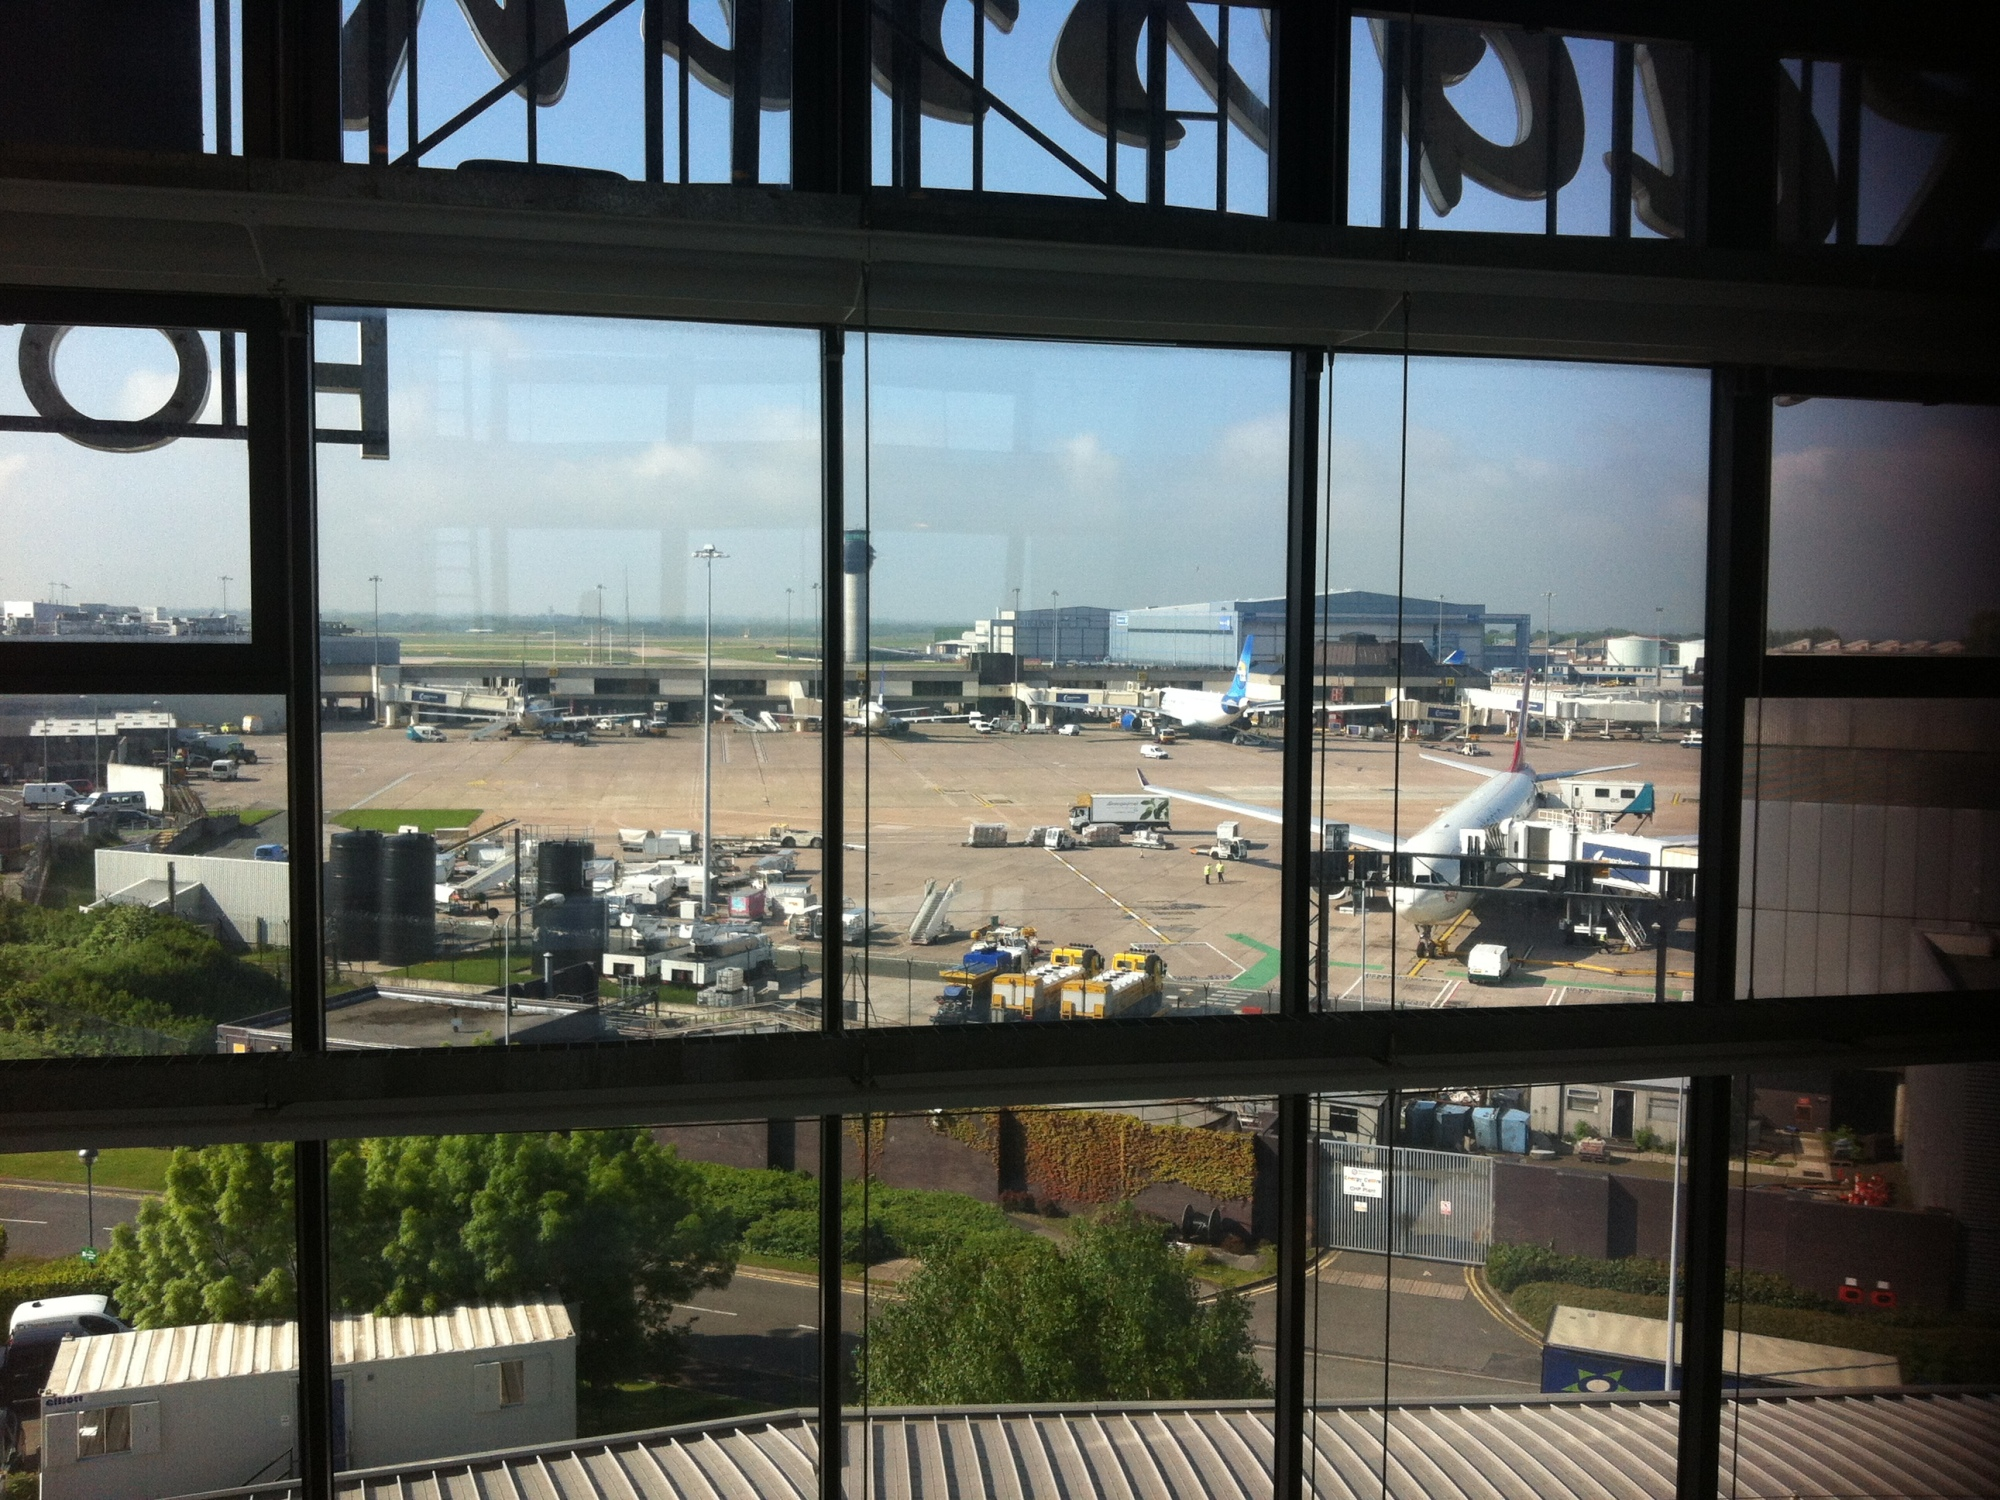 Radisson blu manchester airport review